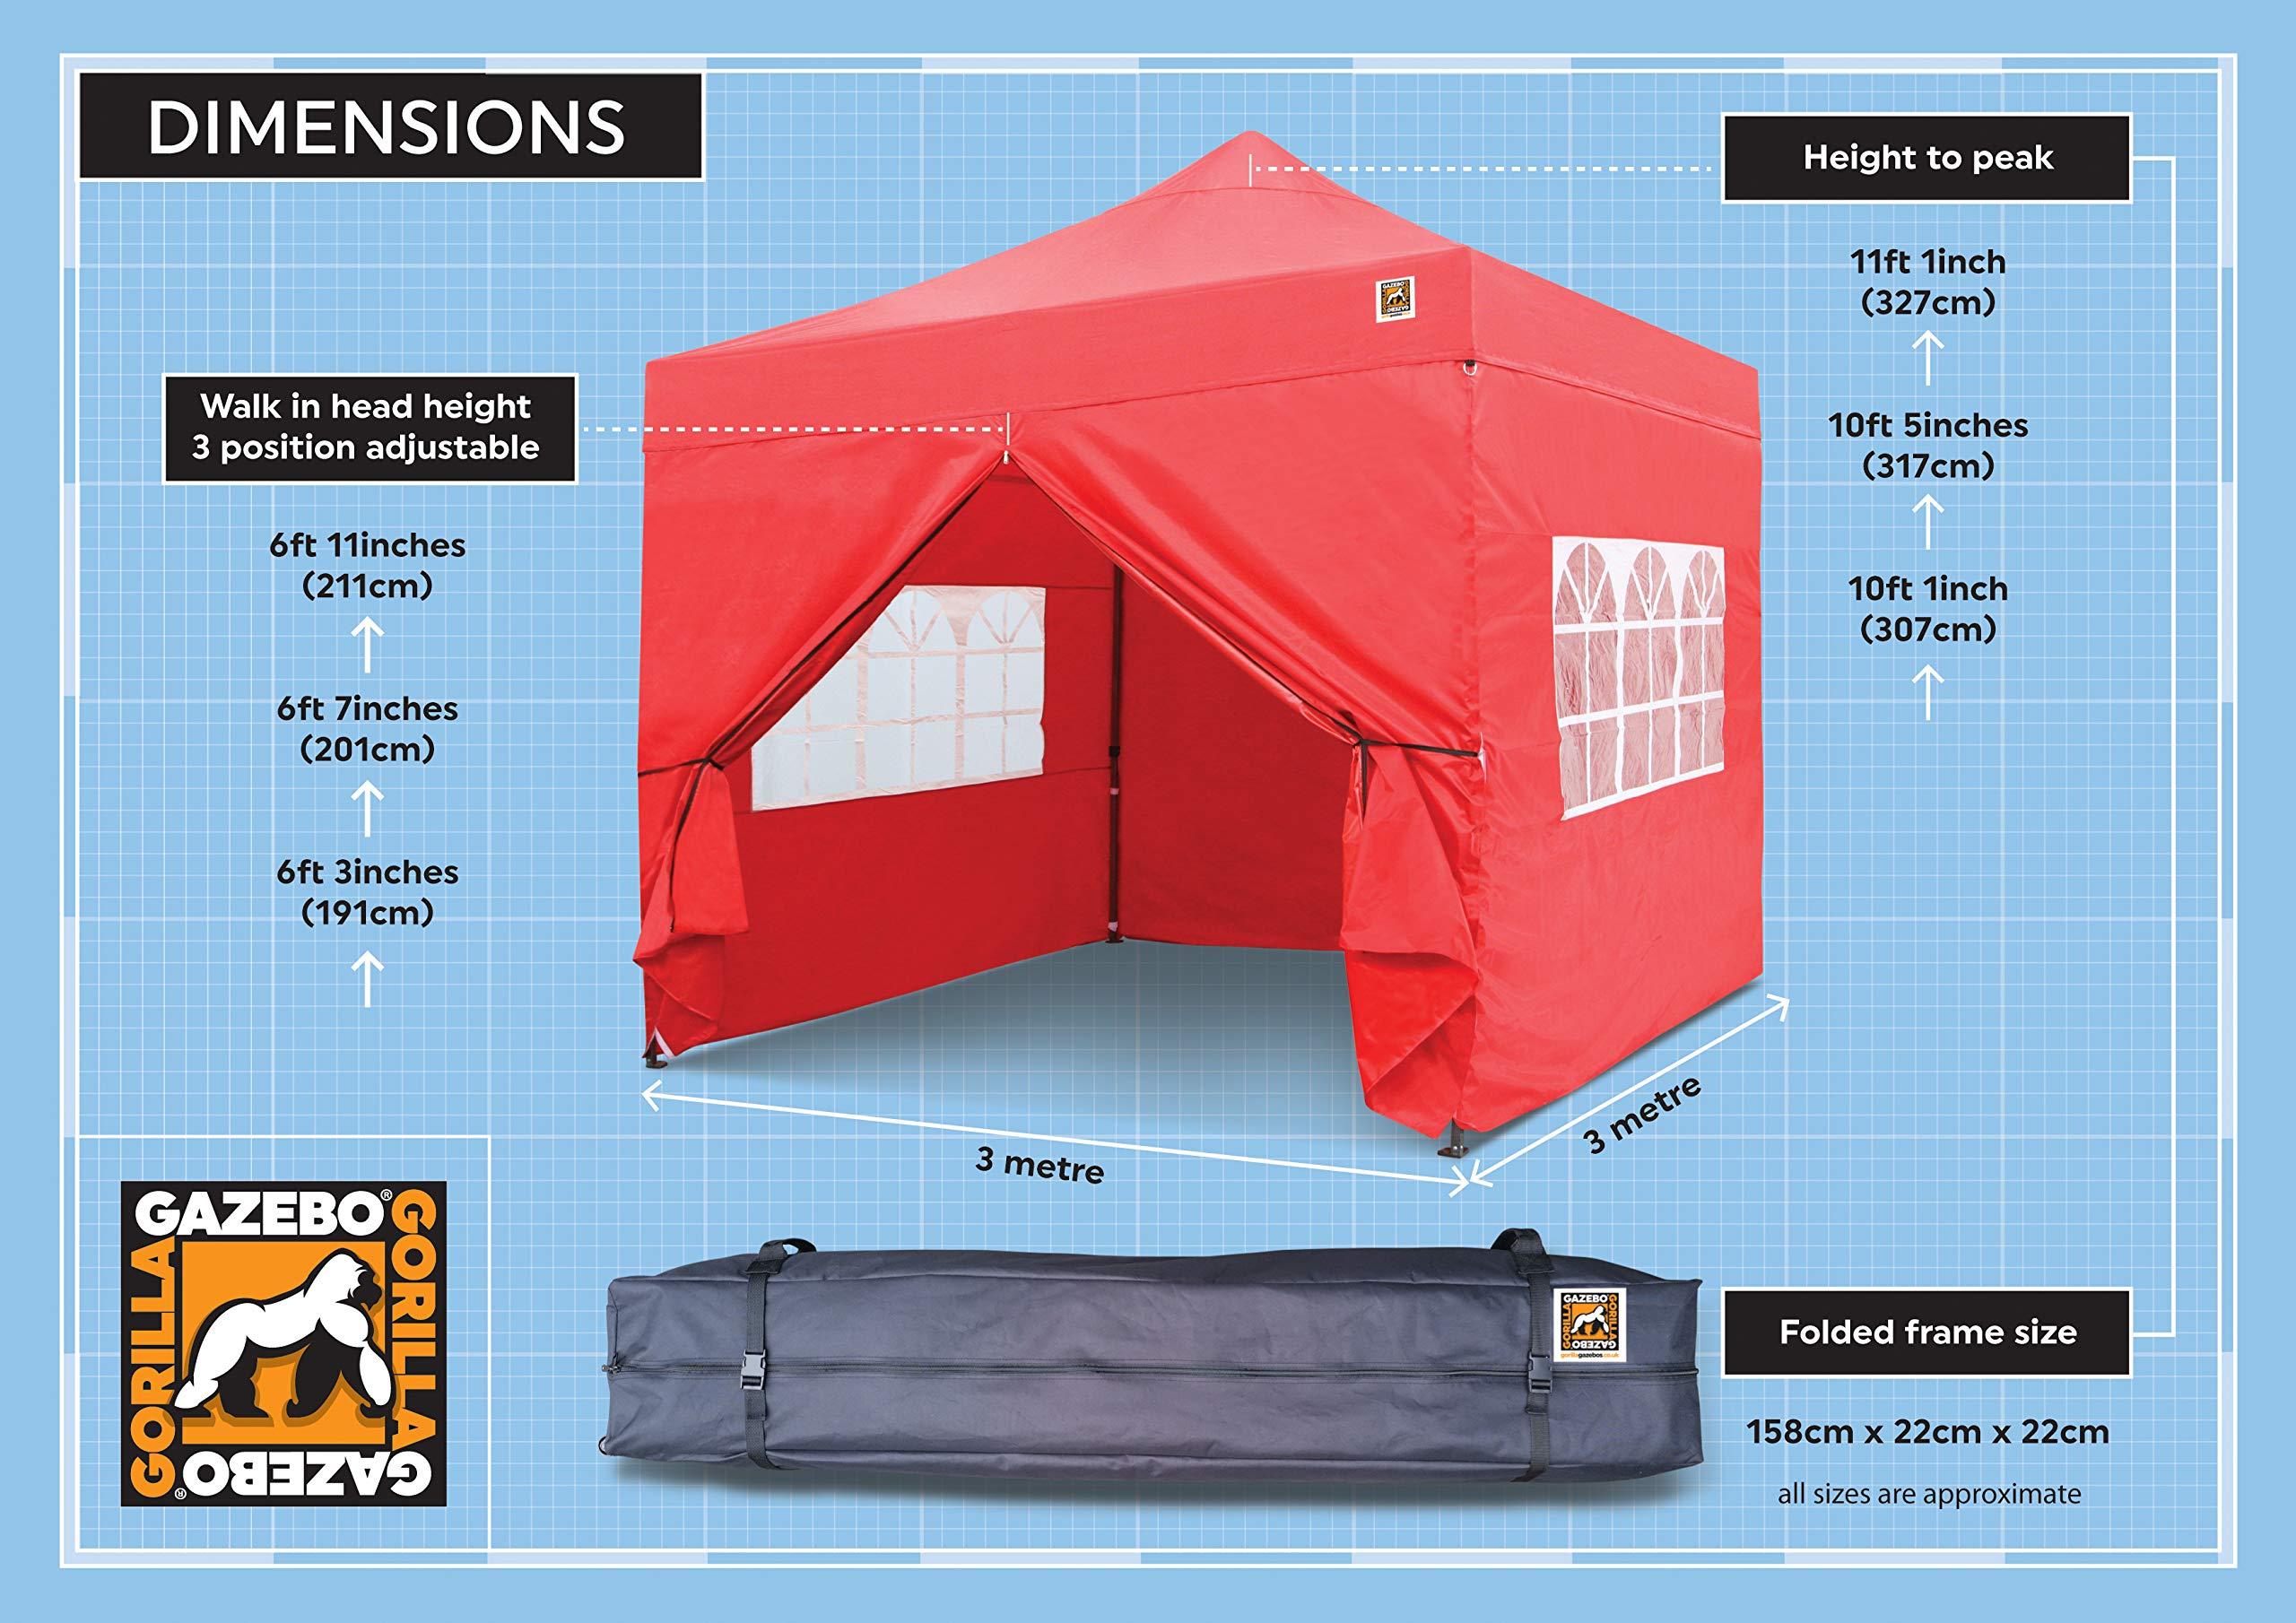 Gorilla Gazebo ® Pop Up 3x3m Heavy Duty Waterproof Commercial Grade Market Stall 4 Side Panels and Wheeled Carrybag… 4